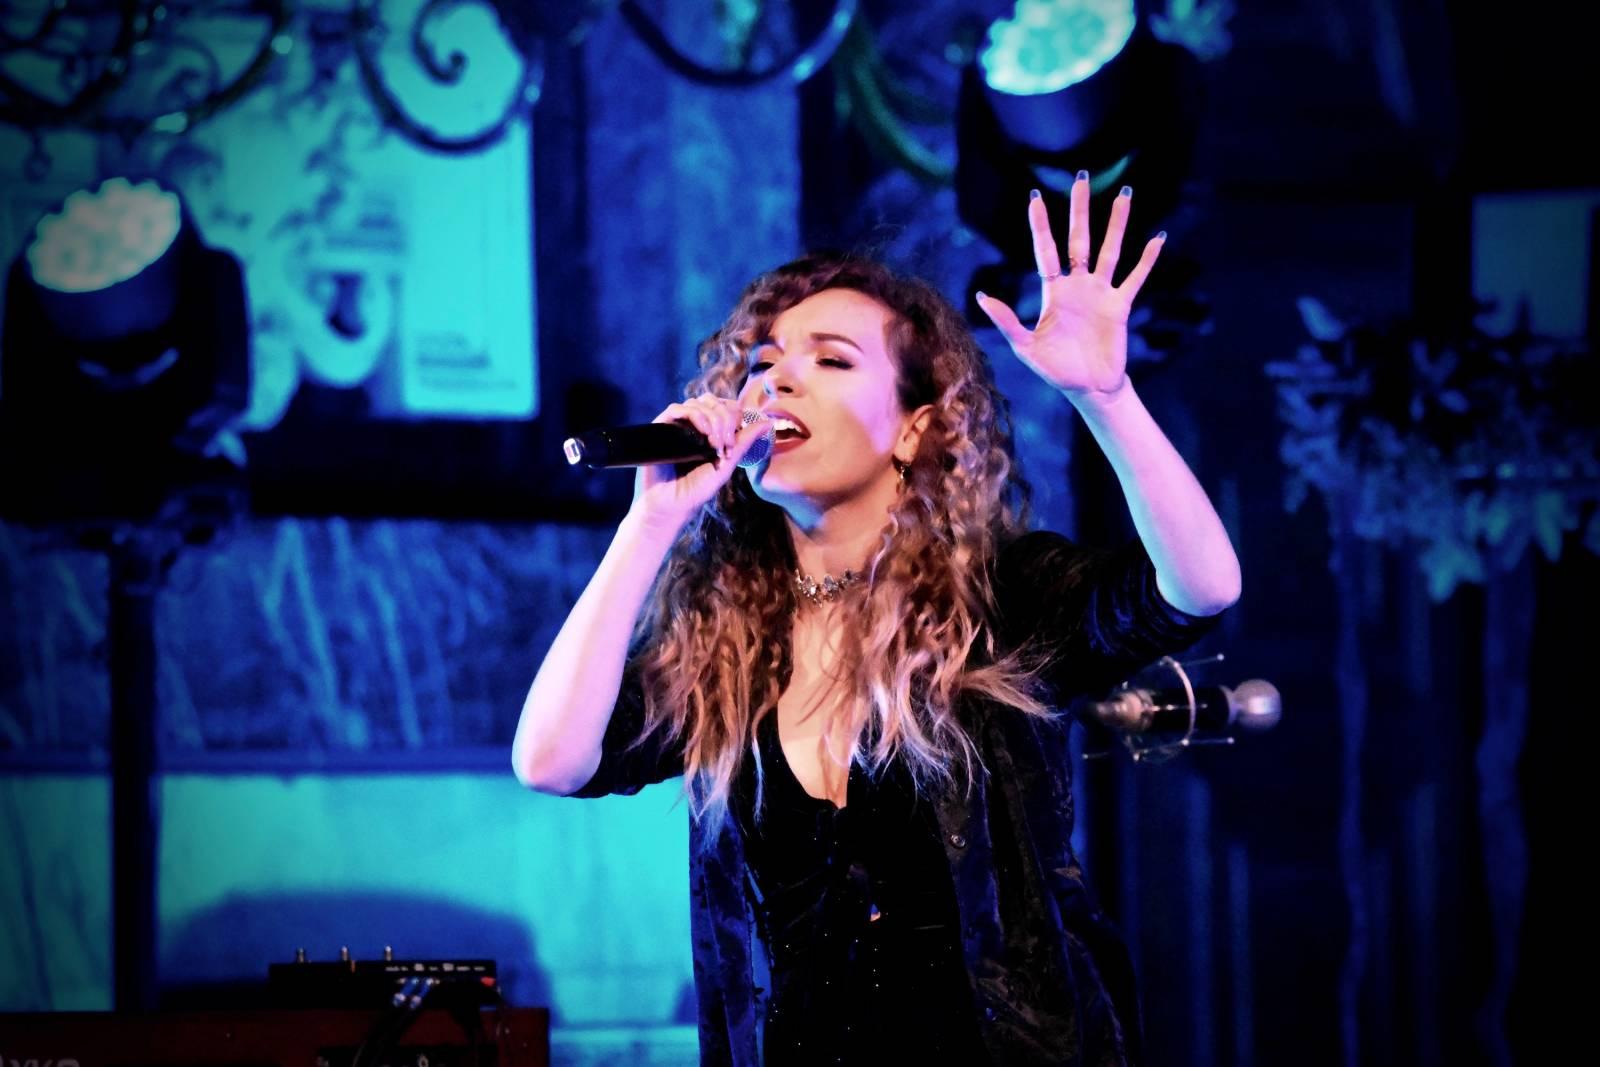 Dunja artiest zangeres livemuziek house of events (4)